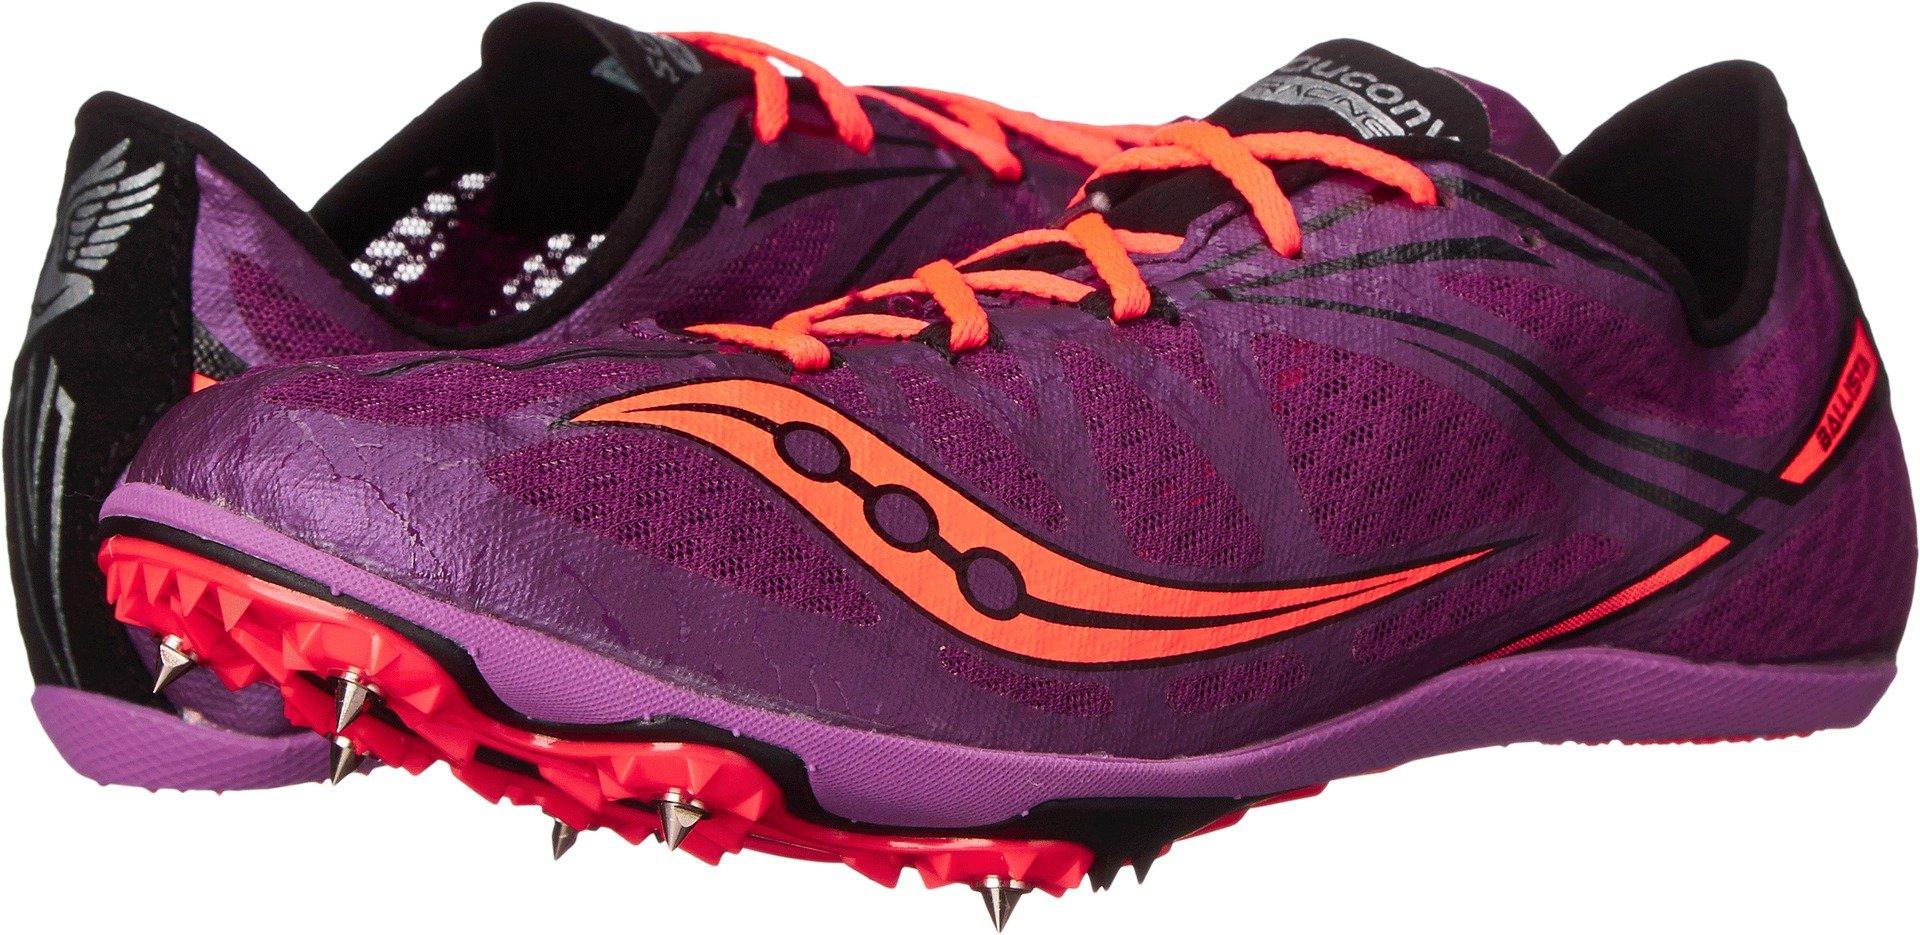 Saucony Women's Ballista Spike Shoe, Purple/Vizi Coral, 9.5 M US